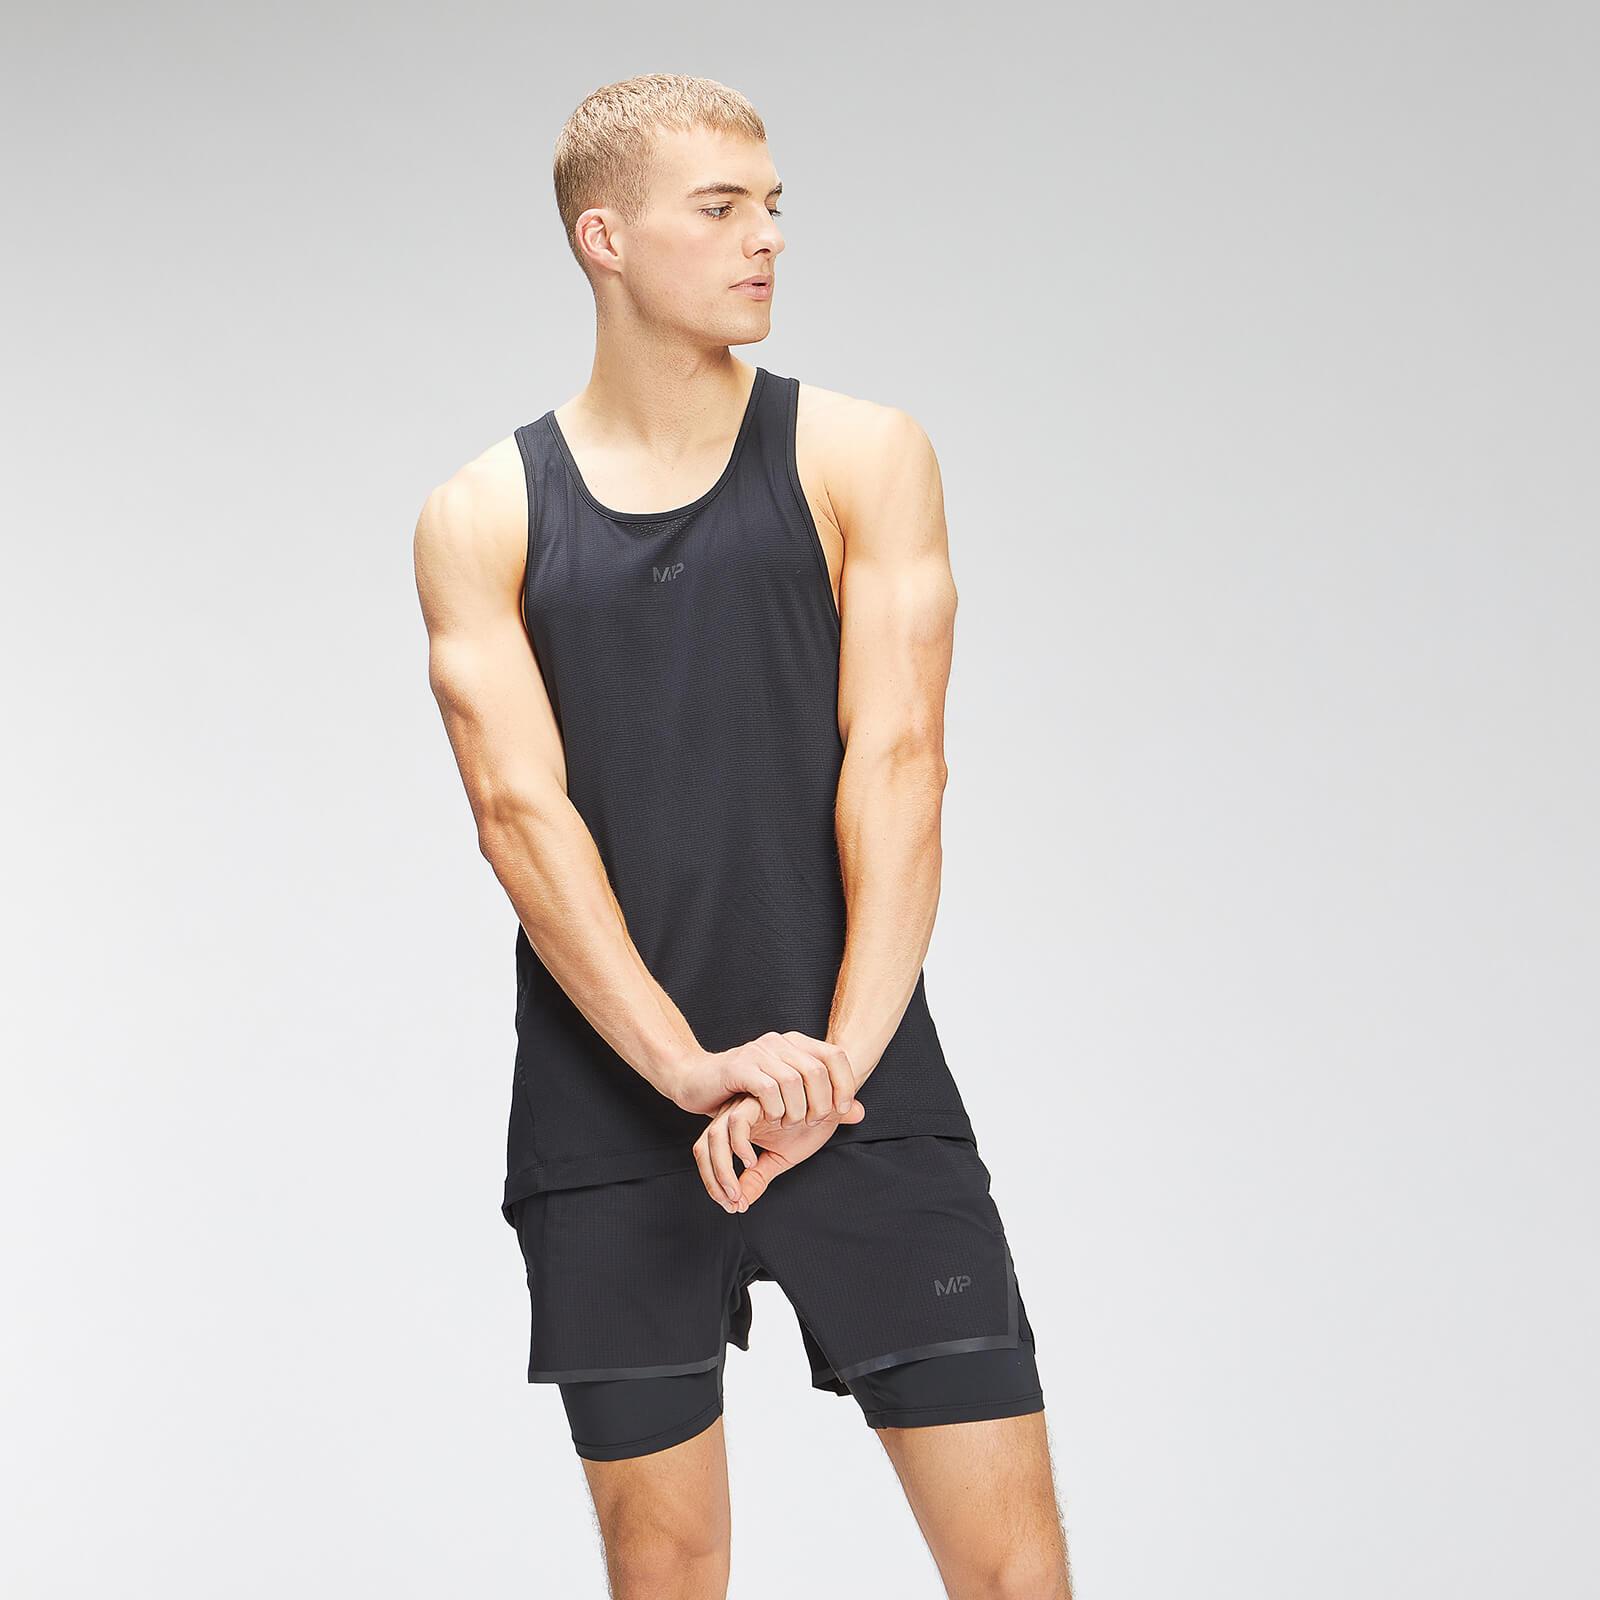 Купить MP Men's Velocity Stringer Vest - Black - L, Myprotein International